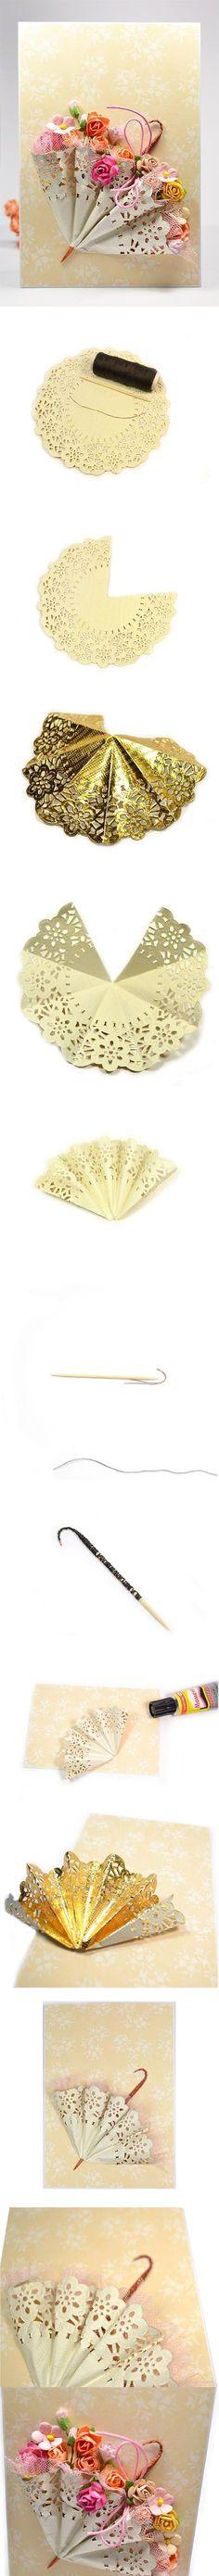 Cute Mini Umbrella with Paper Doily Doilies Crafts, Paper Doilies, Diy Paper, Paper Art, Paper Crafts, Mini Umbrella, Umbrella Cards, Small Umbrella, Flower Crafts